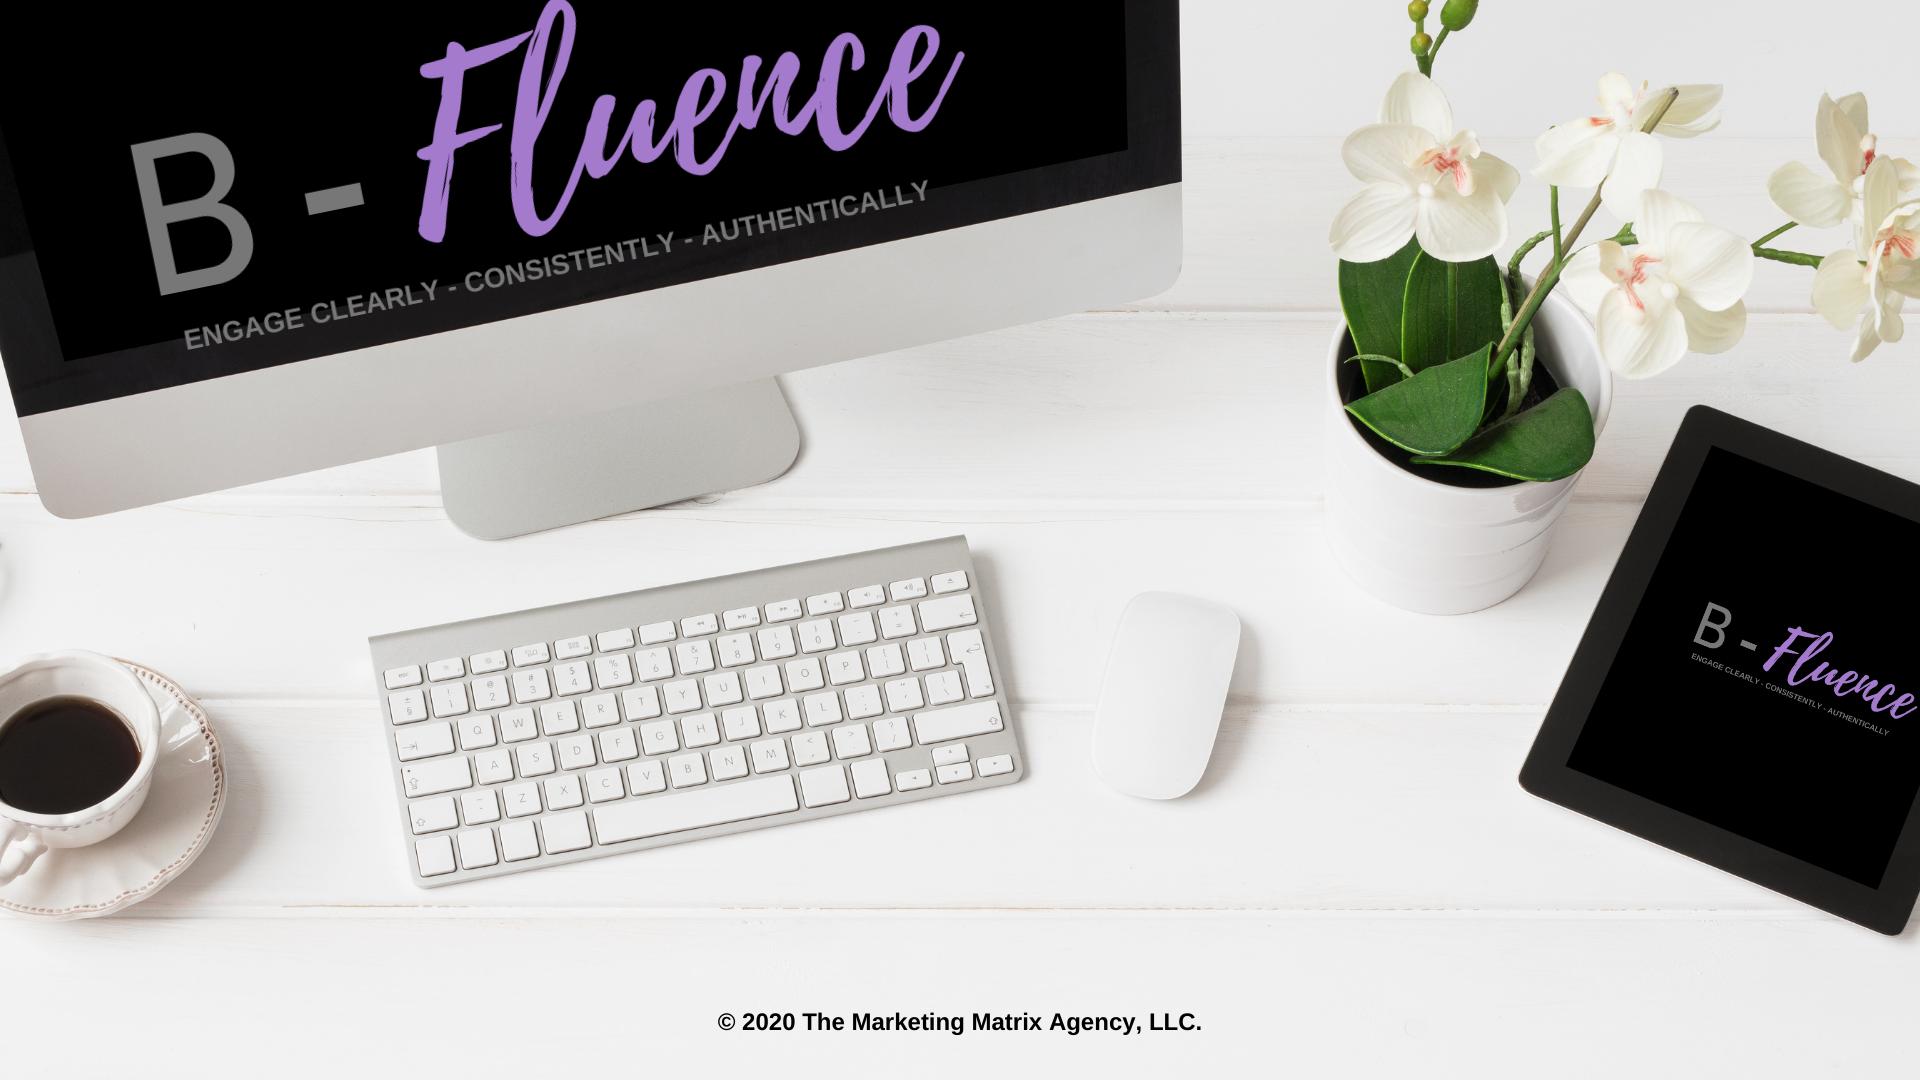 B-FLUENCE: Marketing Made Personal